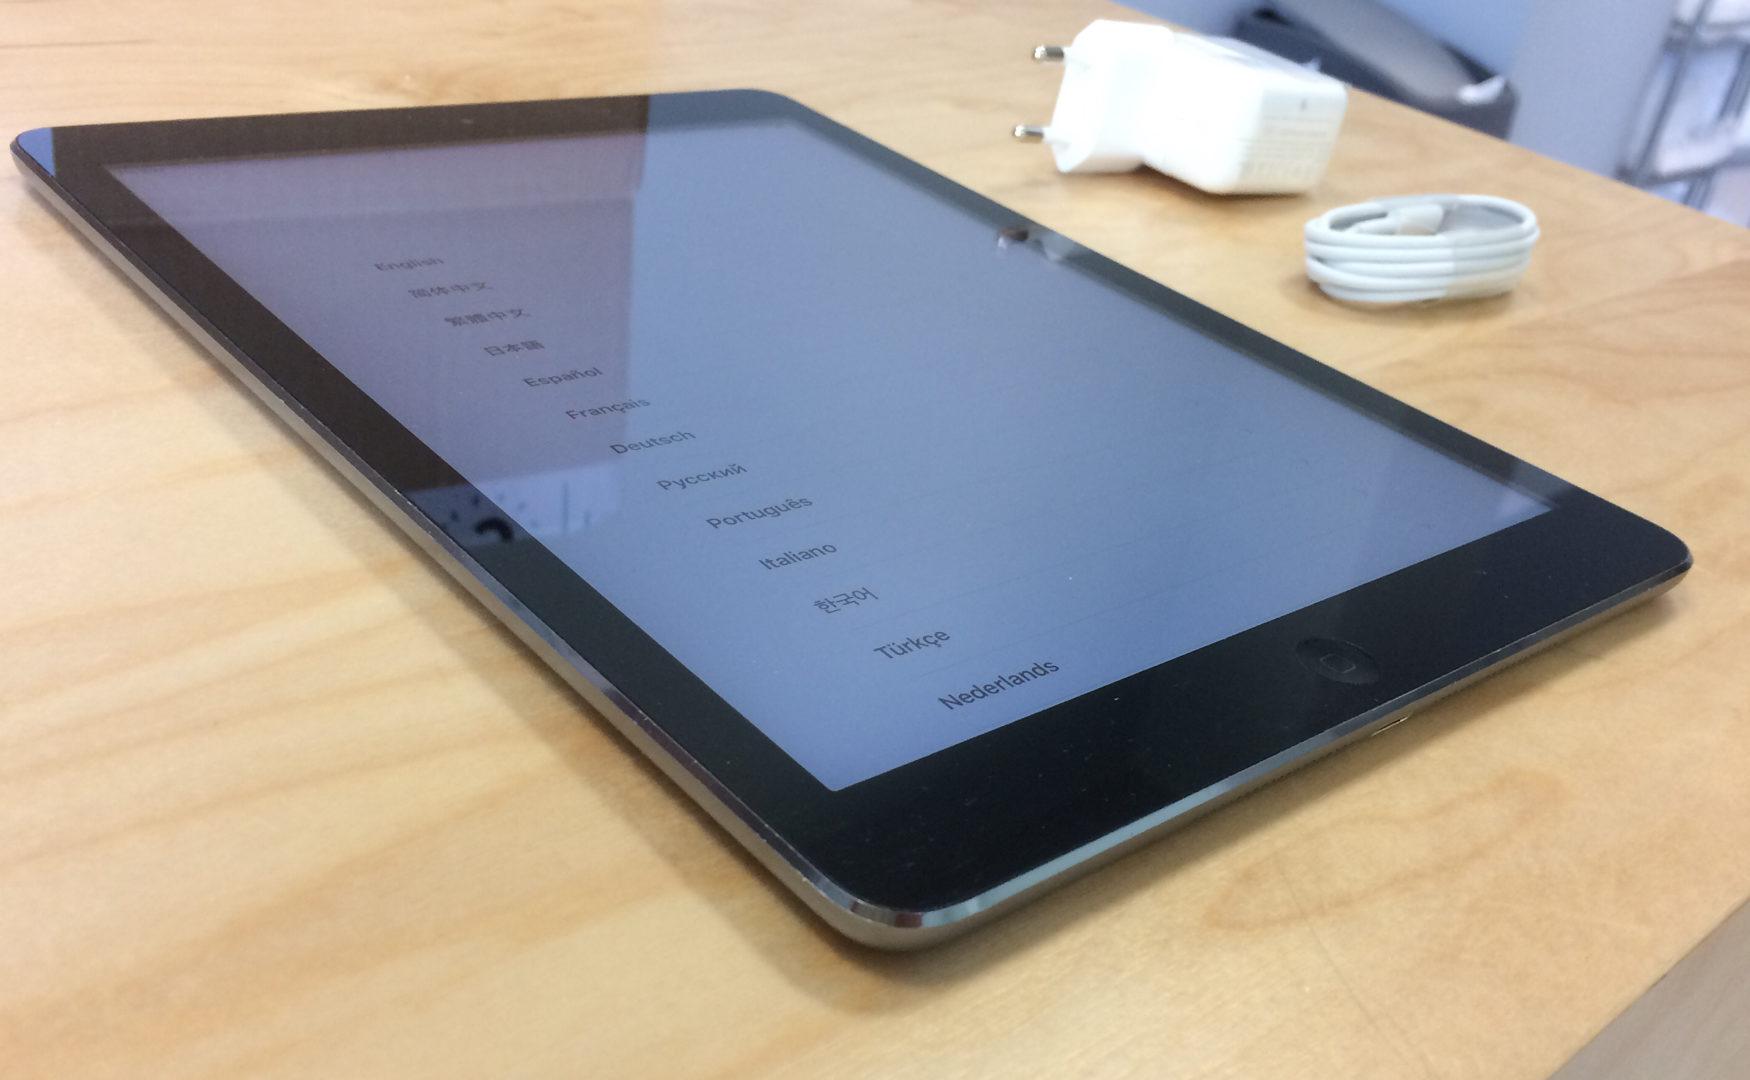 iPad Air (Wi-Fi + 4G), 64 GB, Space Gray, imagen 3